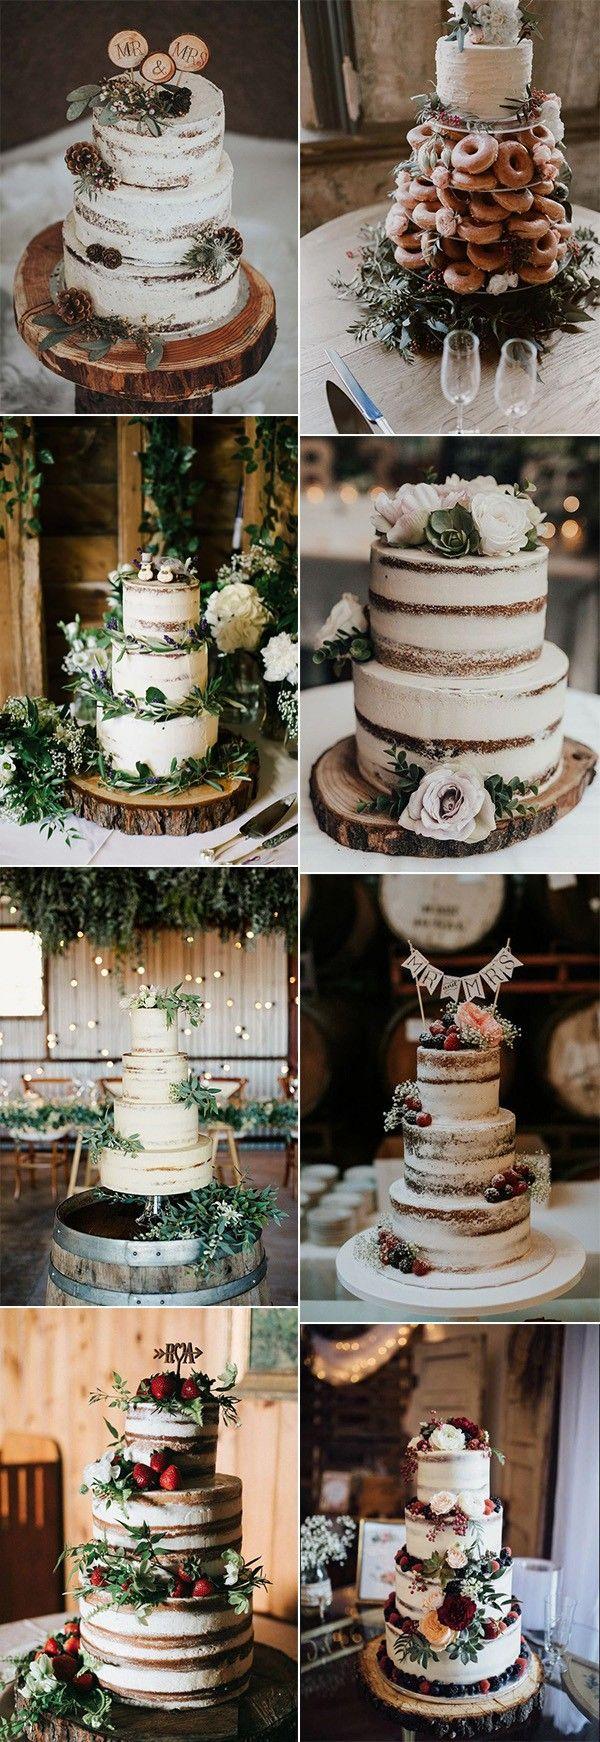 Trending Land rustikale Hochzeitstorten #emmalovesweddings # weddingideas2019   – Wedding Ideas 2020